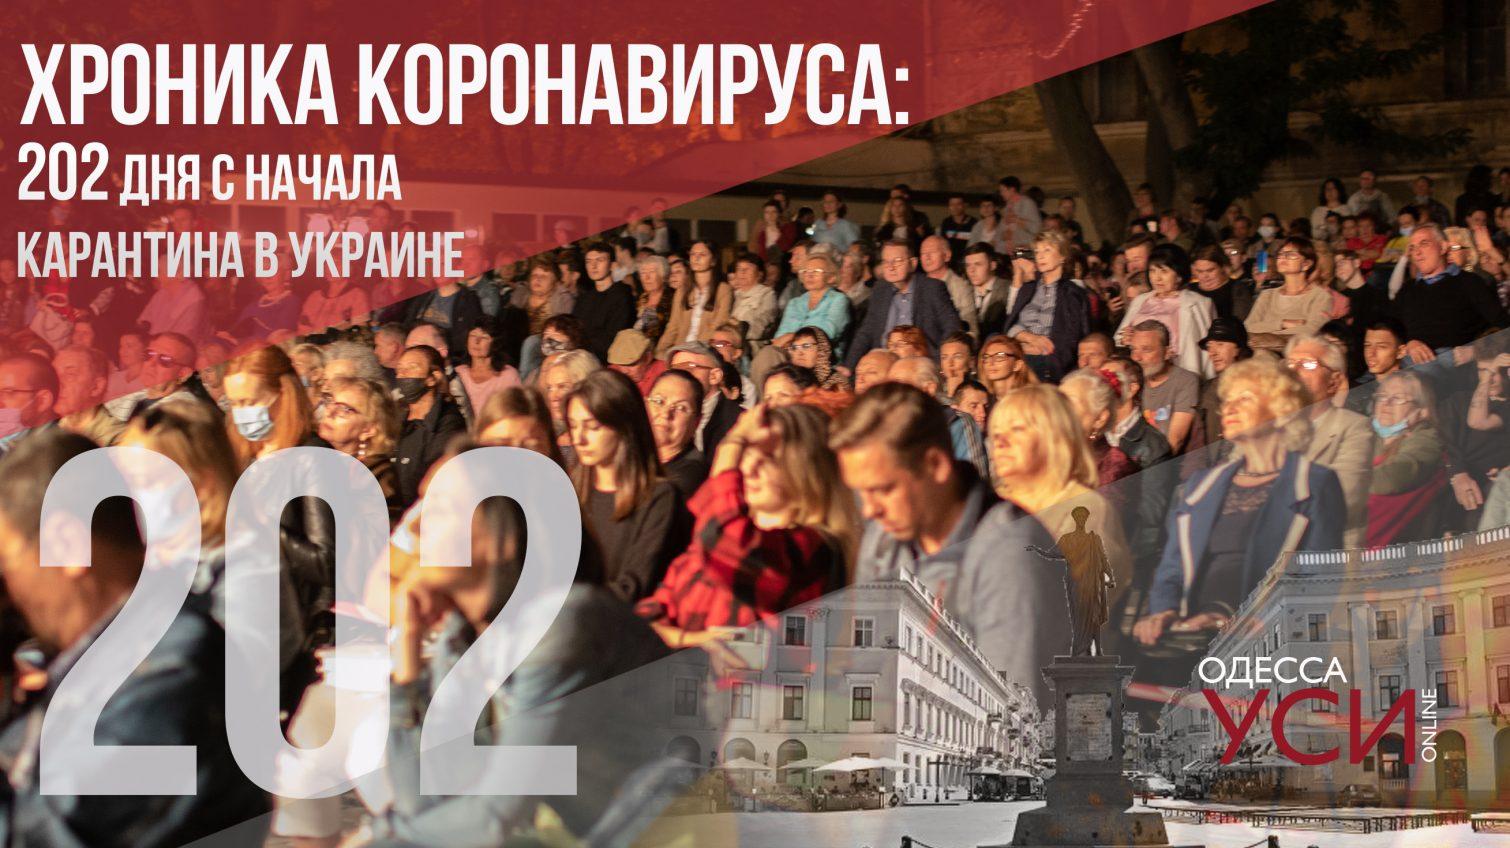 Хроника коронавируса: 202 день со дня начала карантина в Украине «фото»